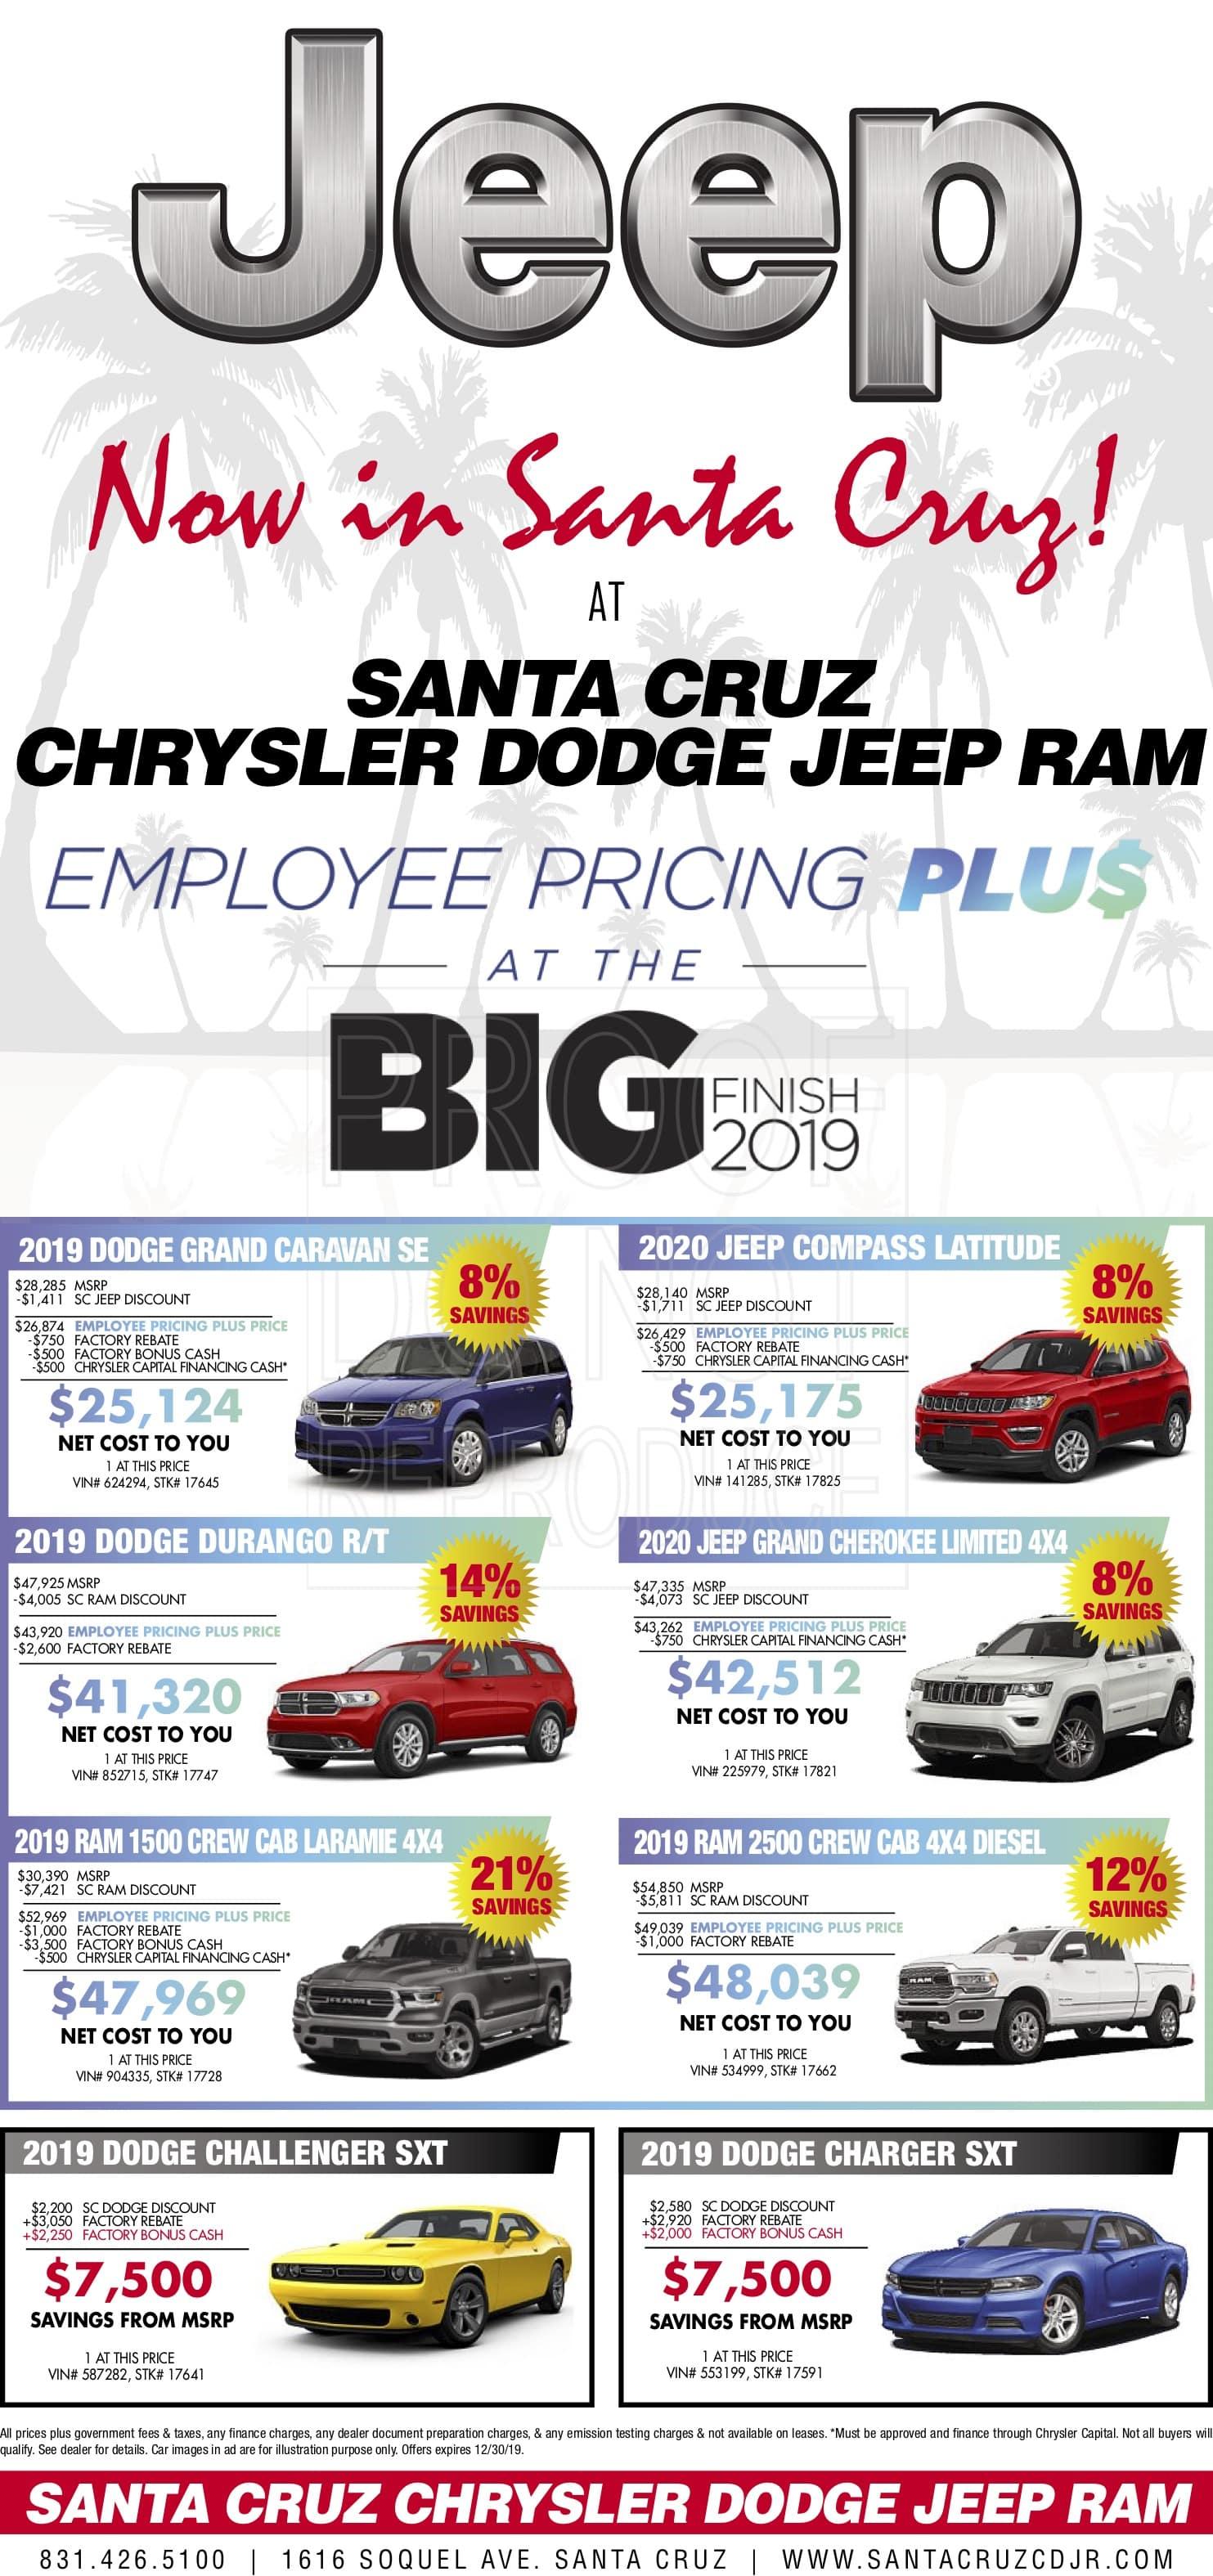 Chrysler Capital Finance >> Employee Pricing Plus Big Finish 2019 Santa Cruz Dodge Ram